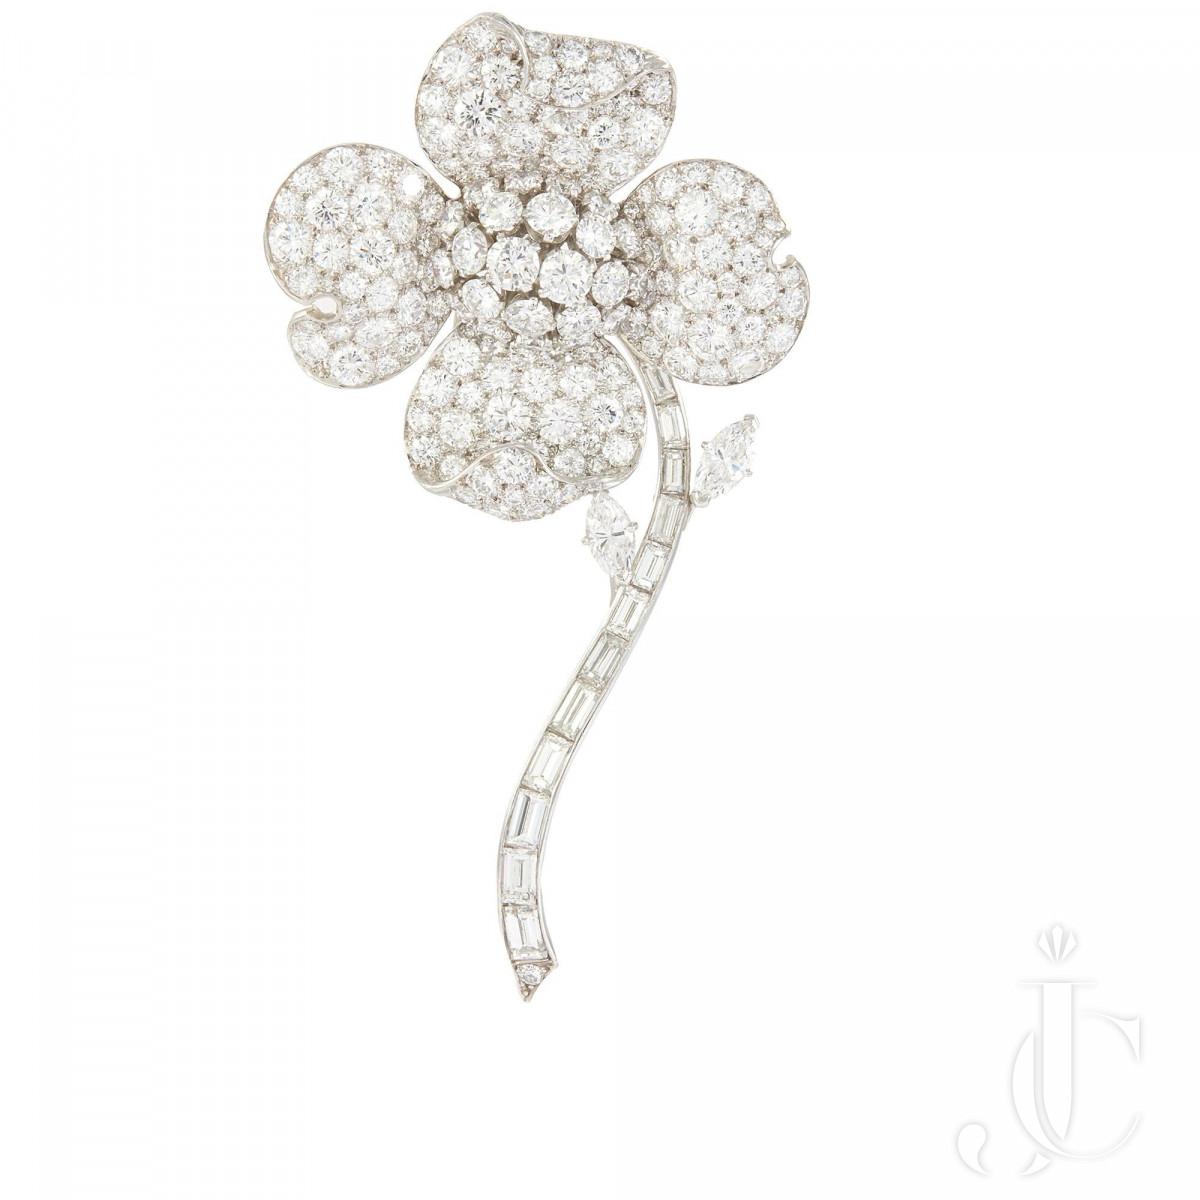 A platinum diamond floral brooch by Van Cleef & Arpels NY